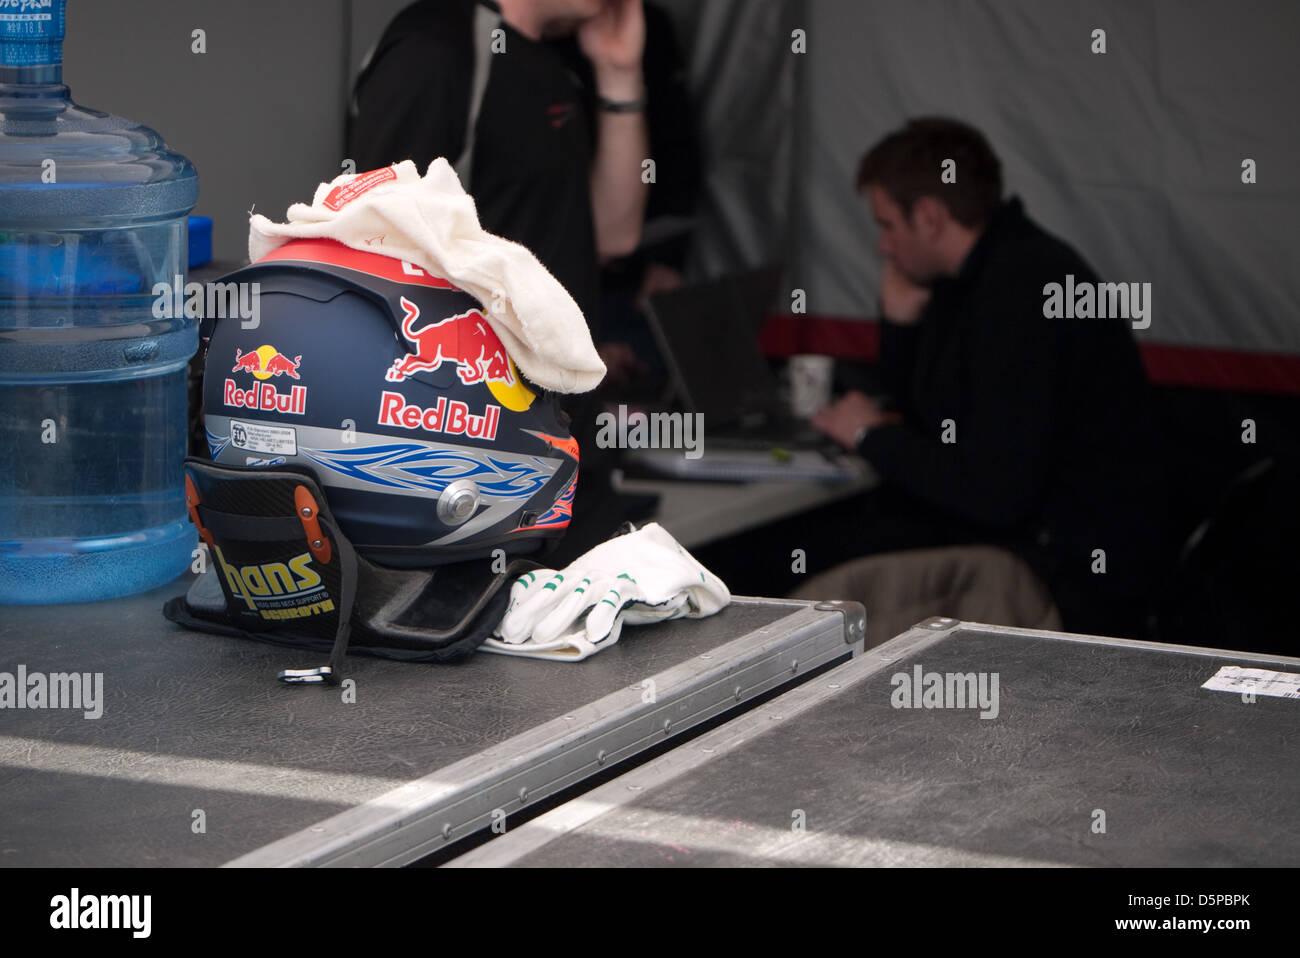 Paddock, racing, helmet with red bull sponsorship, motorsports - Stock Image